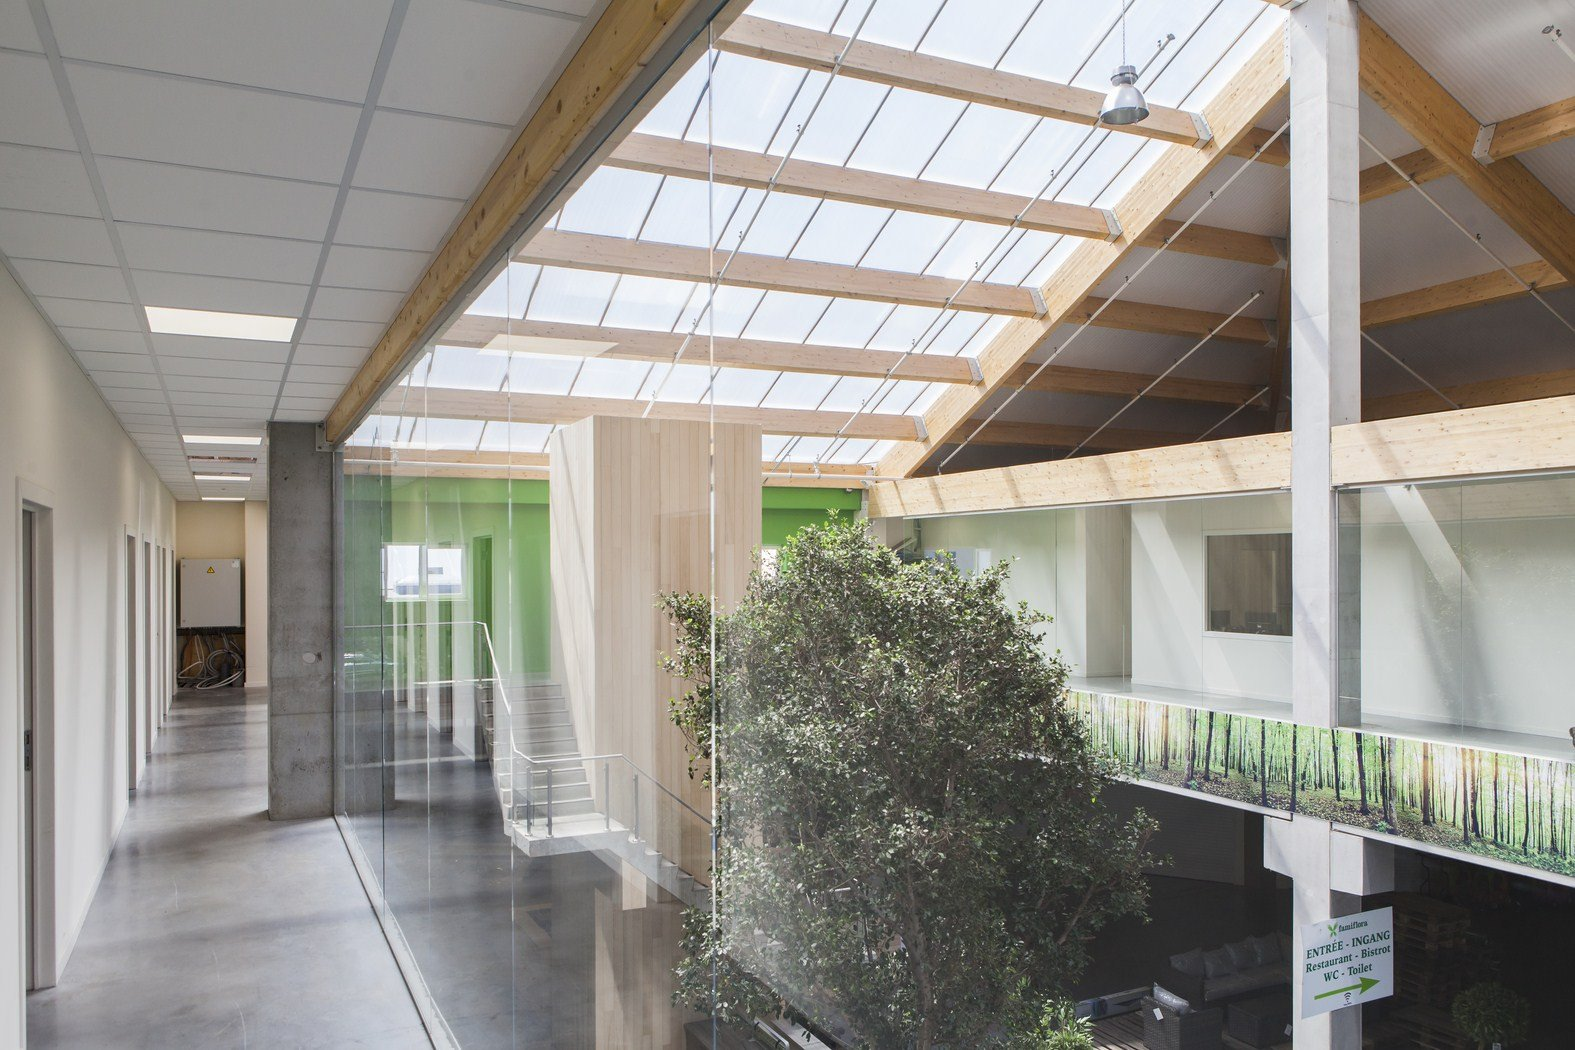 tuincenter famiflora Dottenijs (61).jpg